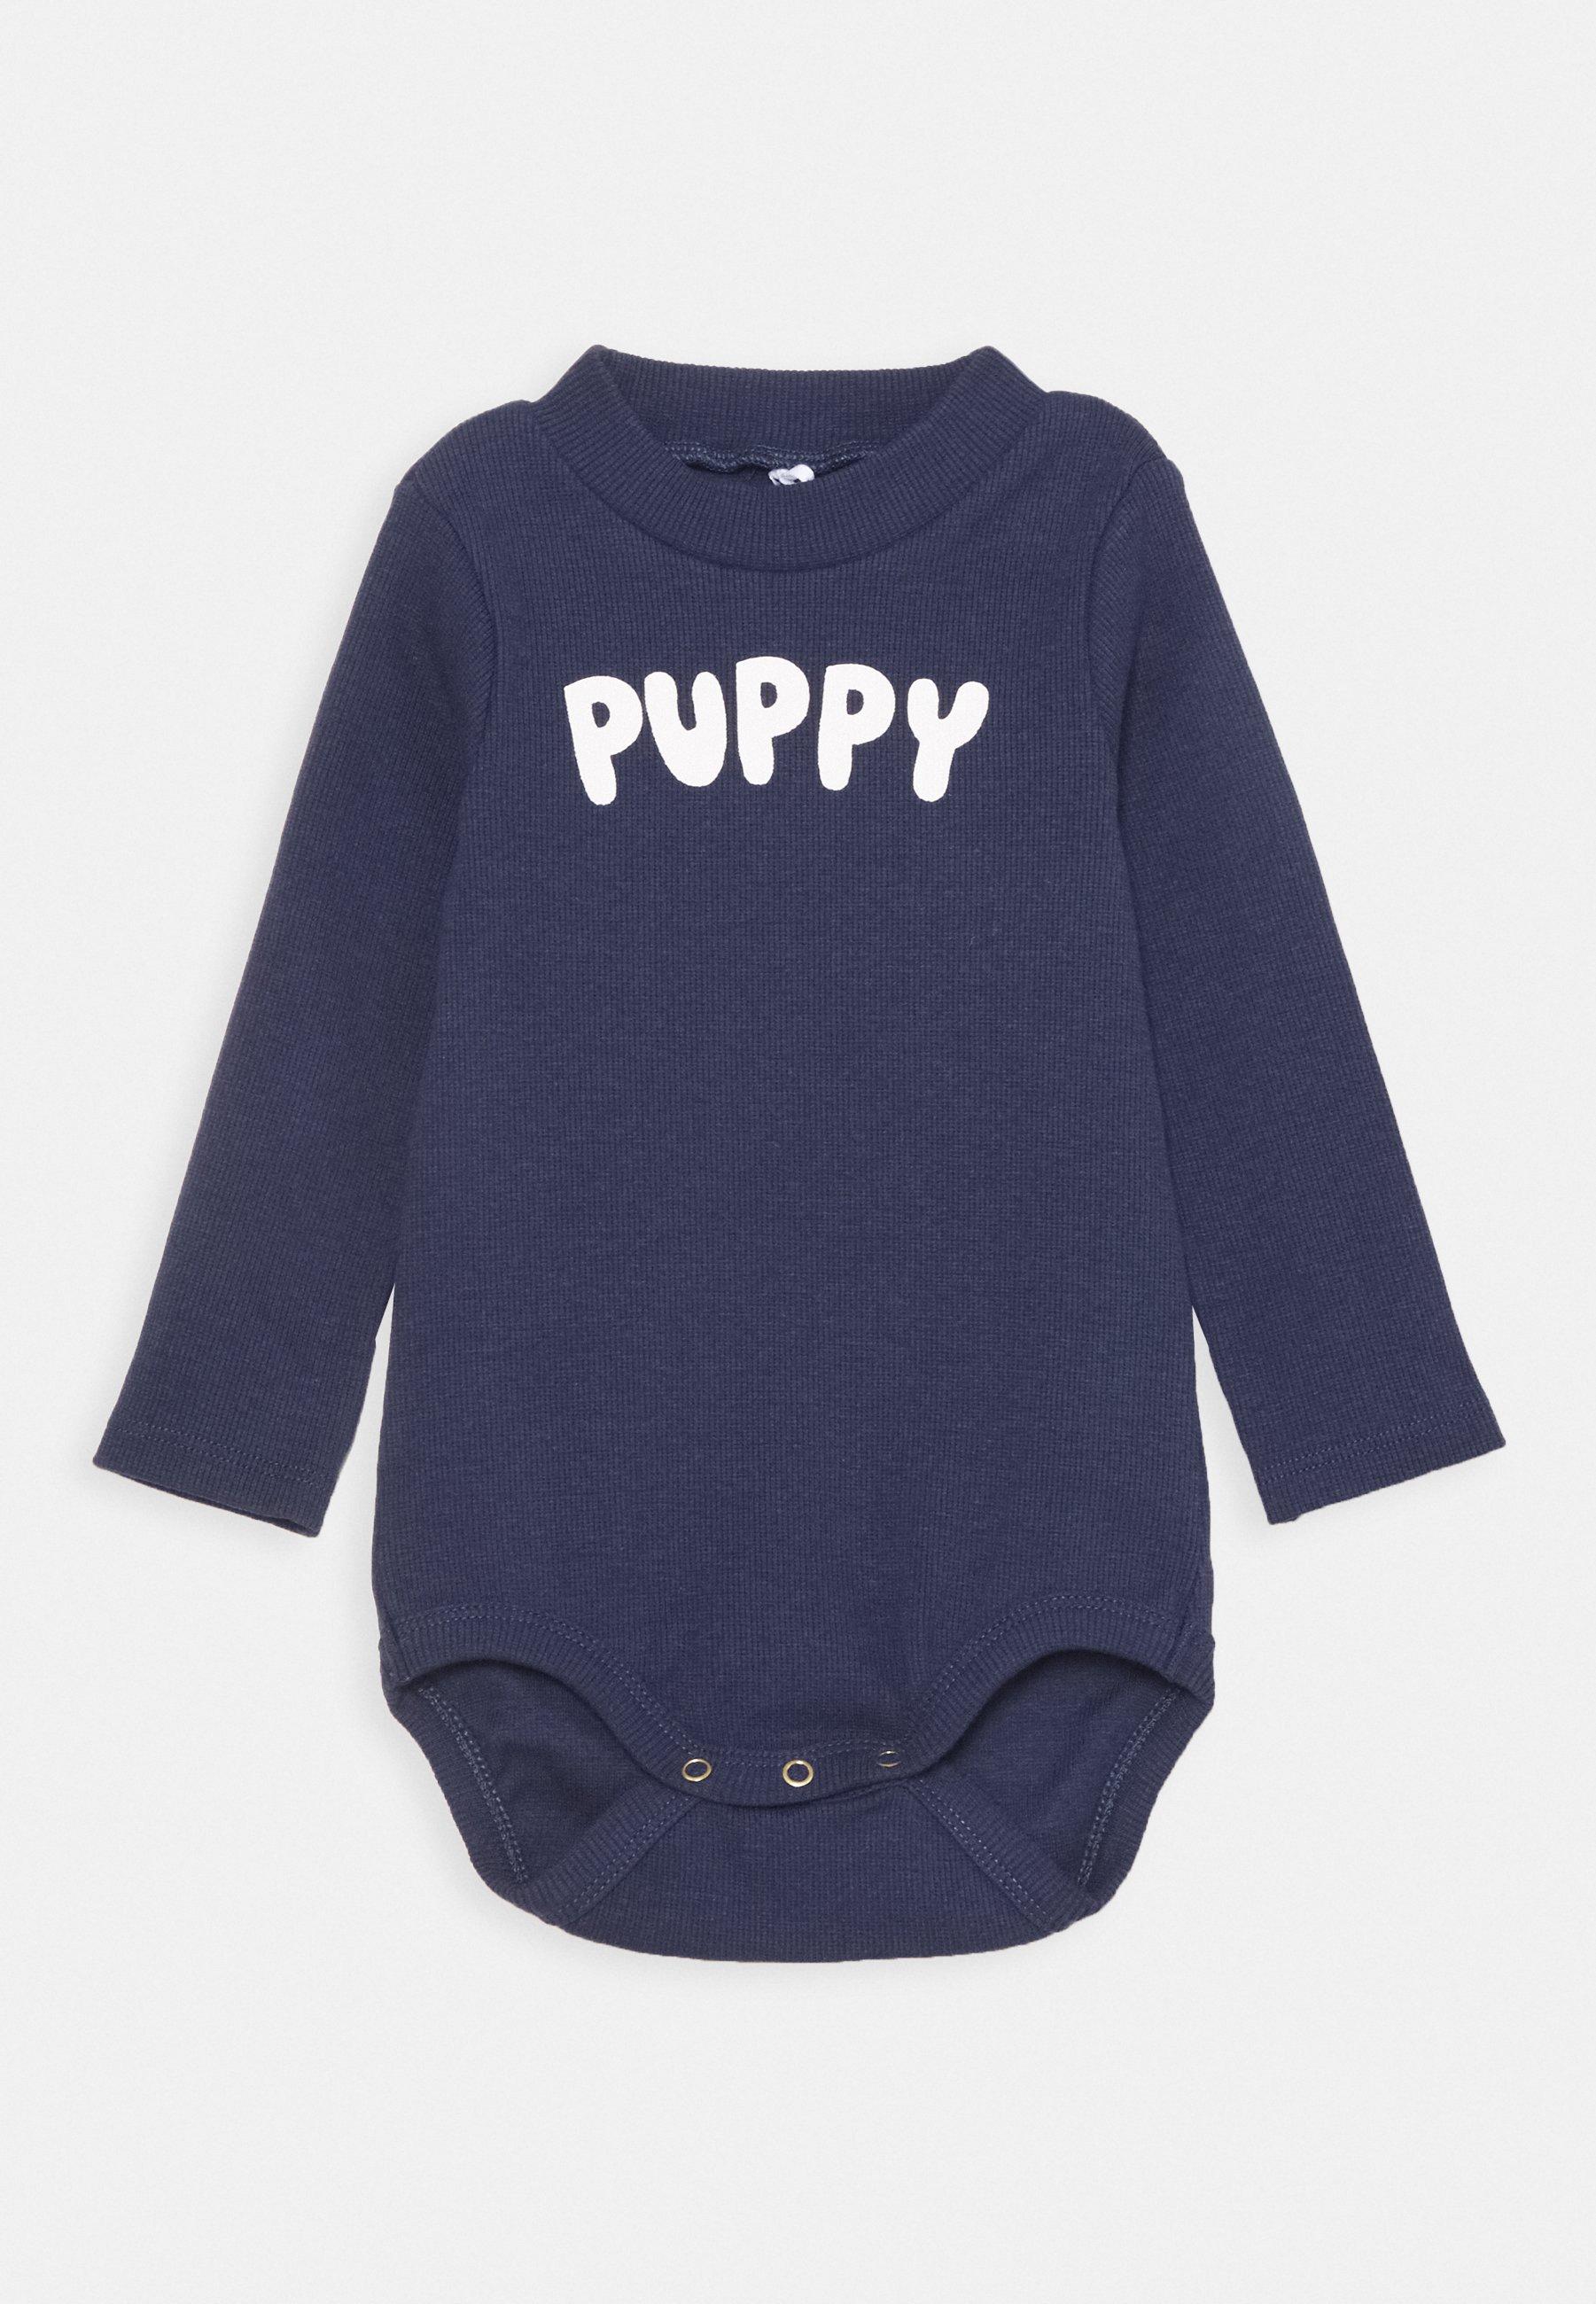 Kids BABY PUPPY UNISEX - Body